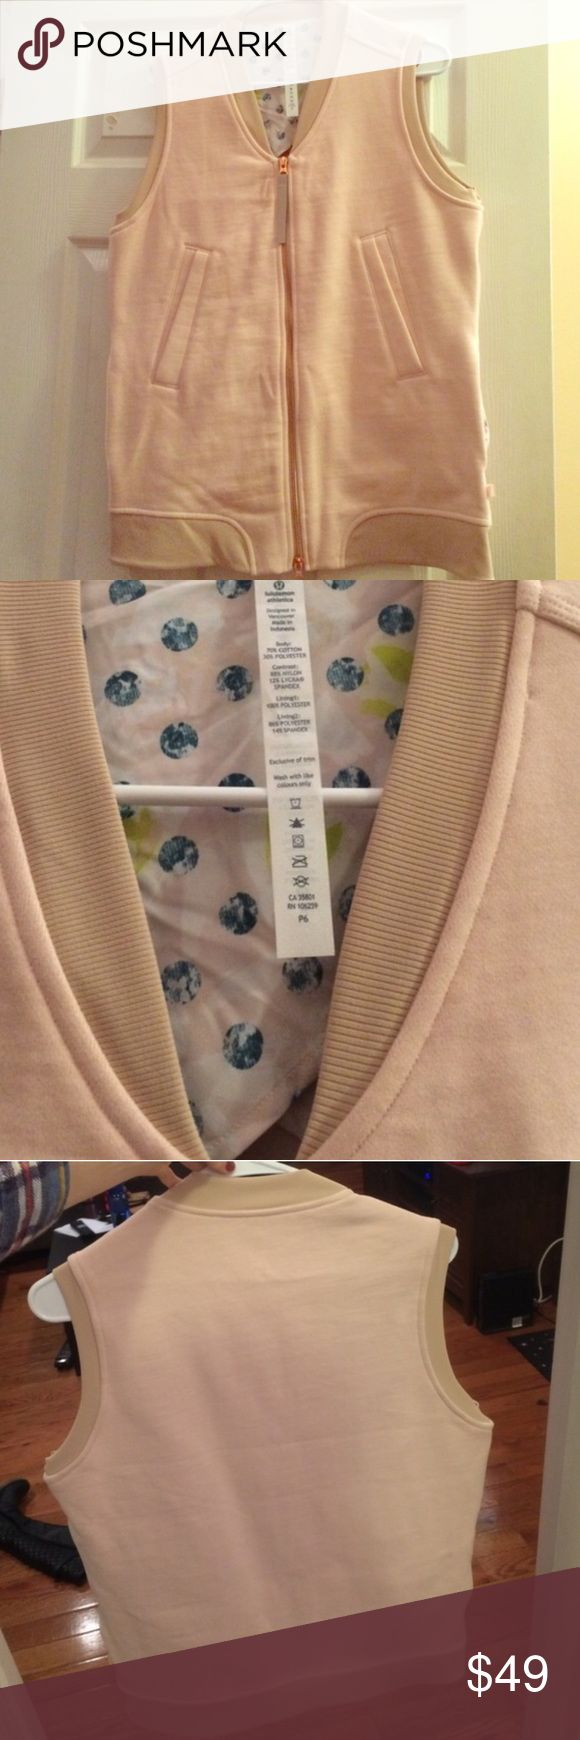 NWOT lululemon vest Brand new without tags size 4 lululemon vest. Color is light pink. Normally $148. Never worn lululemon athletica Jackets & Coats Vests